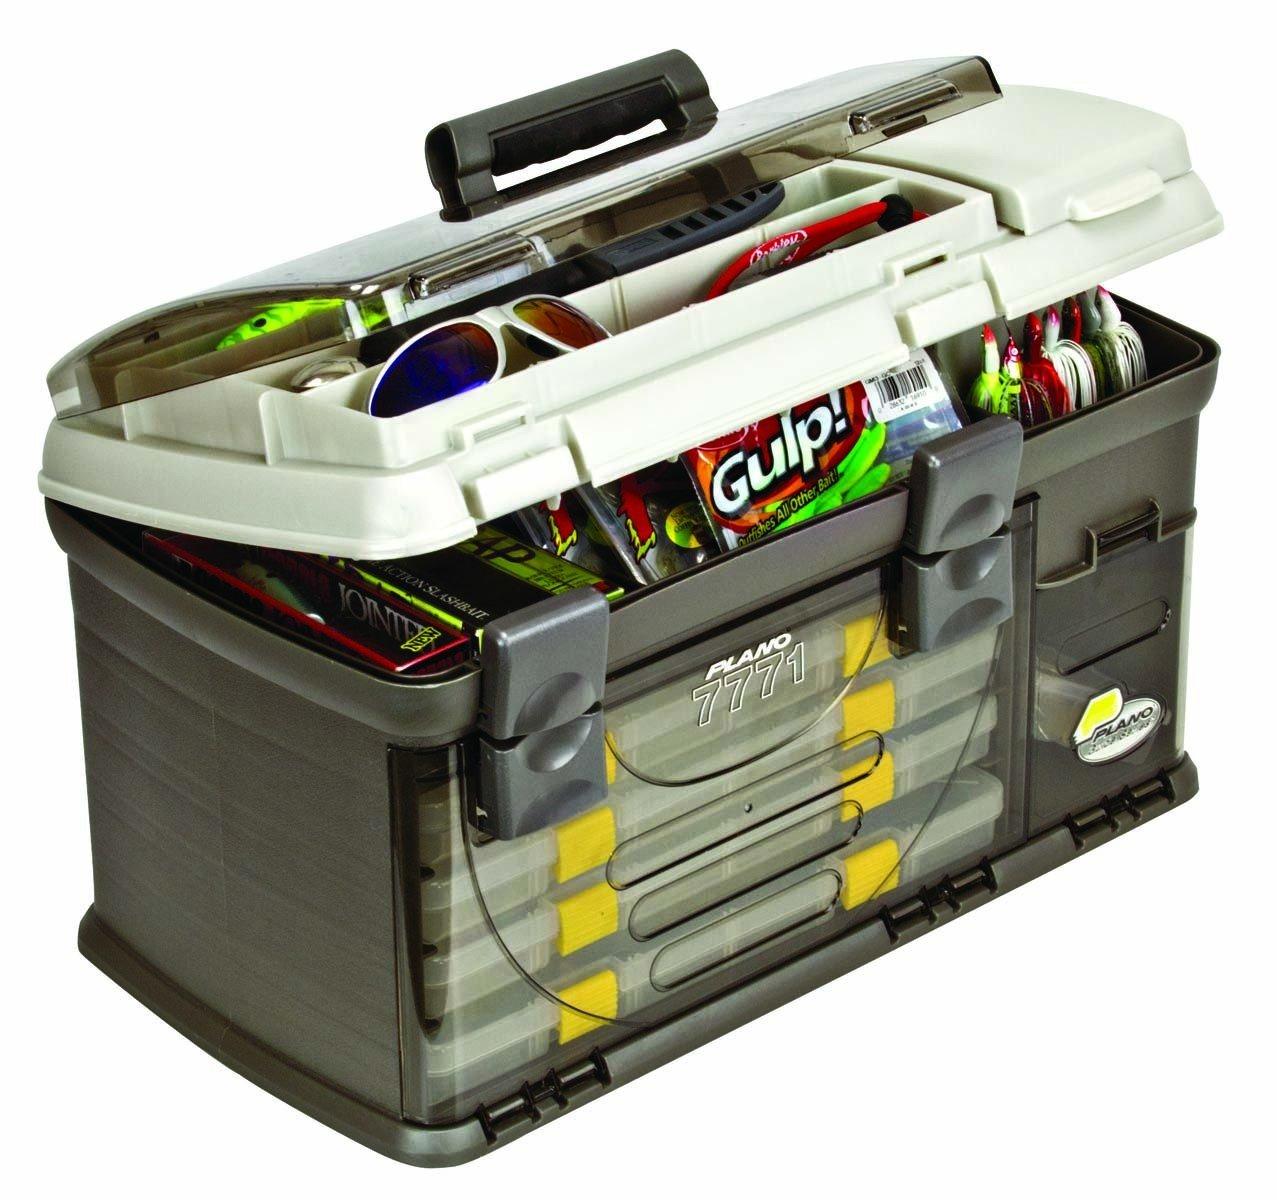 Toolbox for armorer tools ar15 com for Craigslist fishing equipment